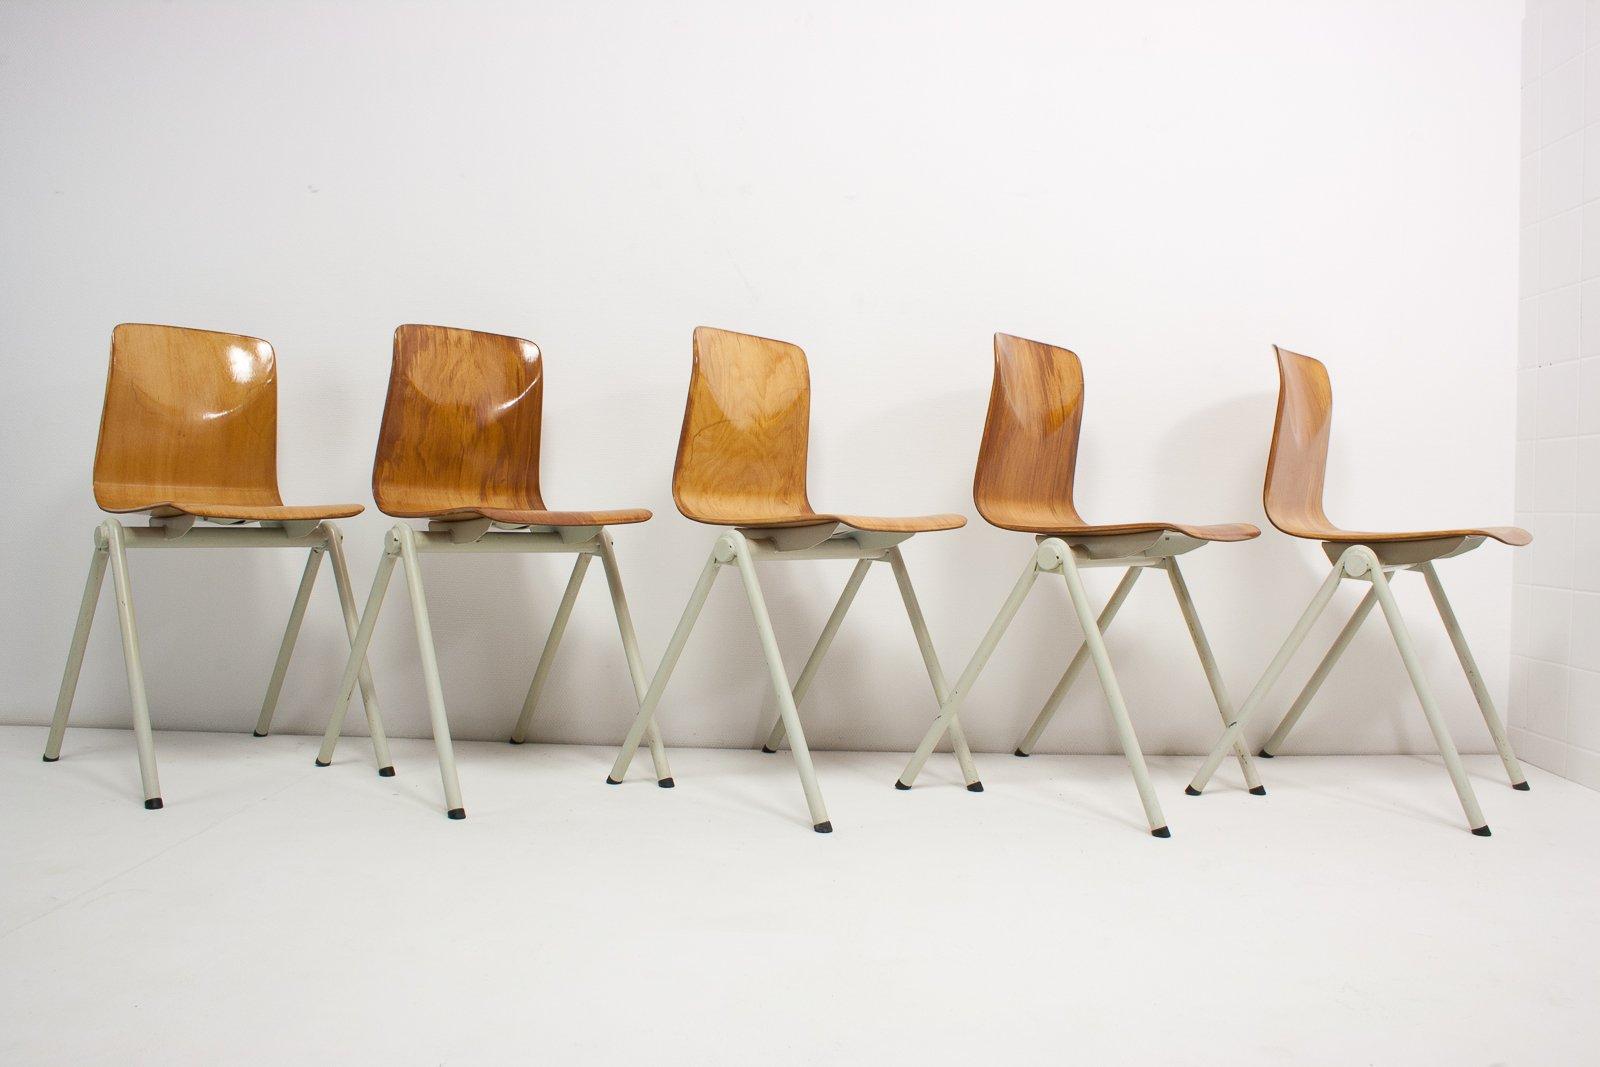 Sedie industriali vintage, set di 5 in vendita su Pamono